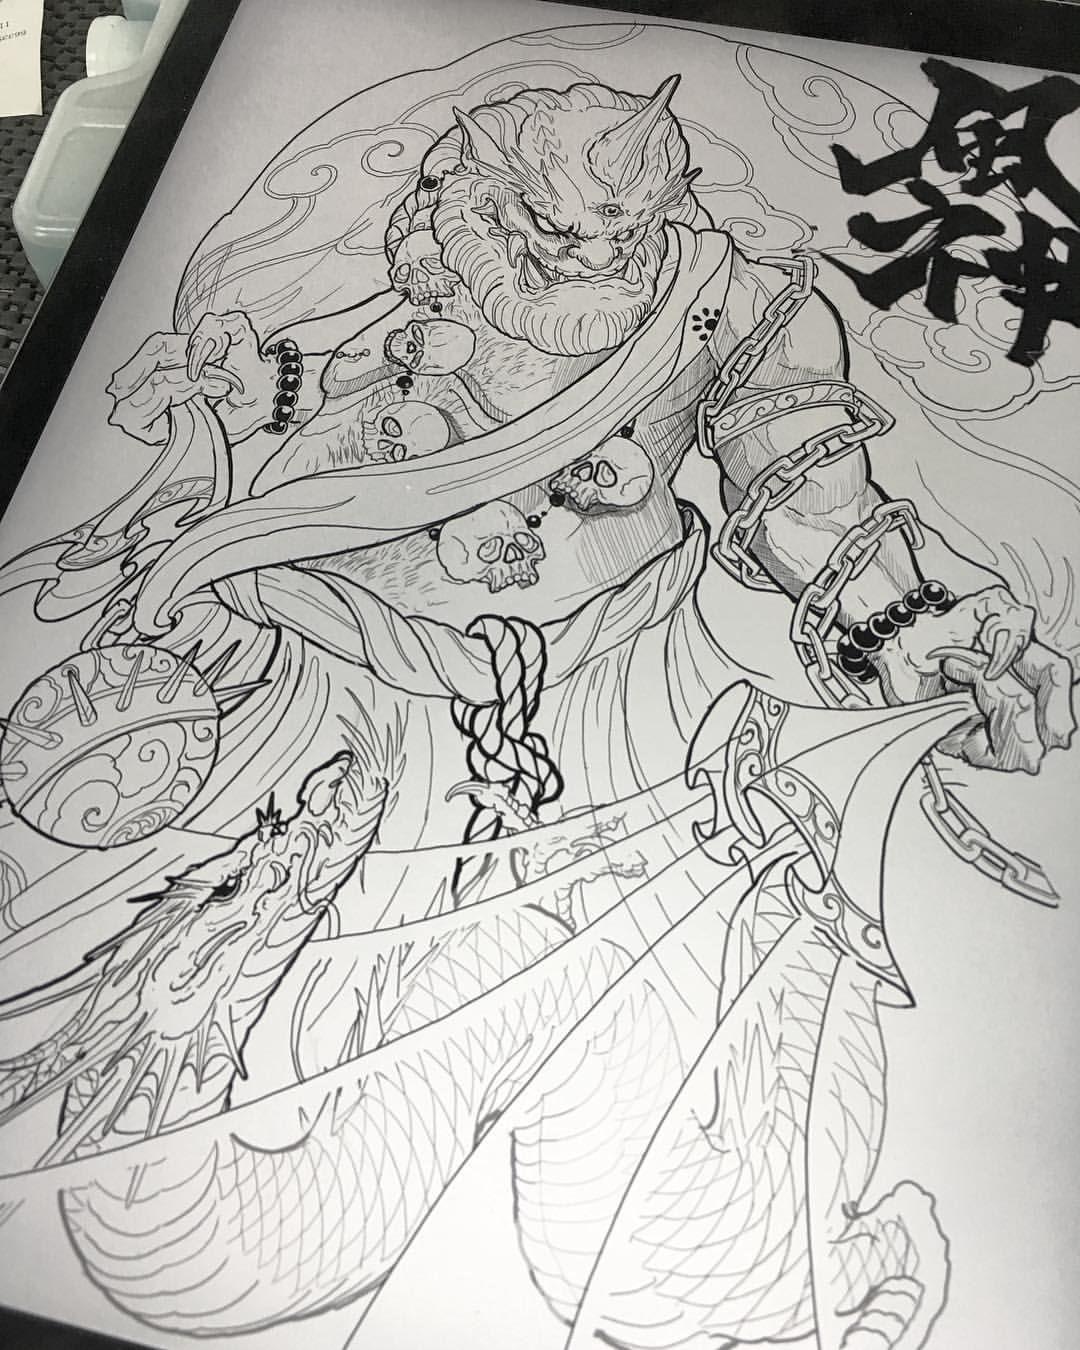 Fujin Vancouvertattoo Irezumicollective Finelinecollective Chronicink Vancouver Fujin Fujintatt Japanese Tattoo Japanese Tattoo Art Japan Tattoo Design